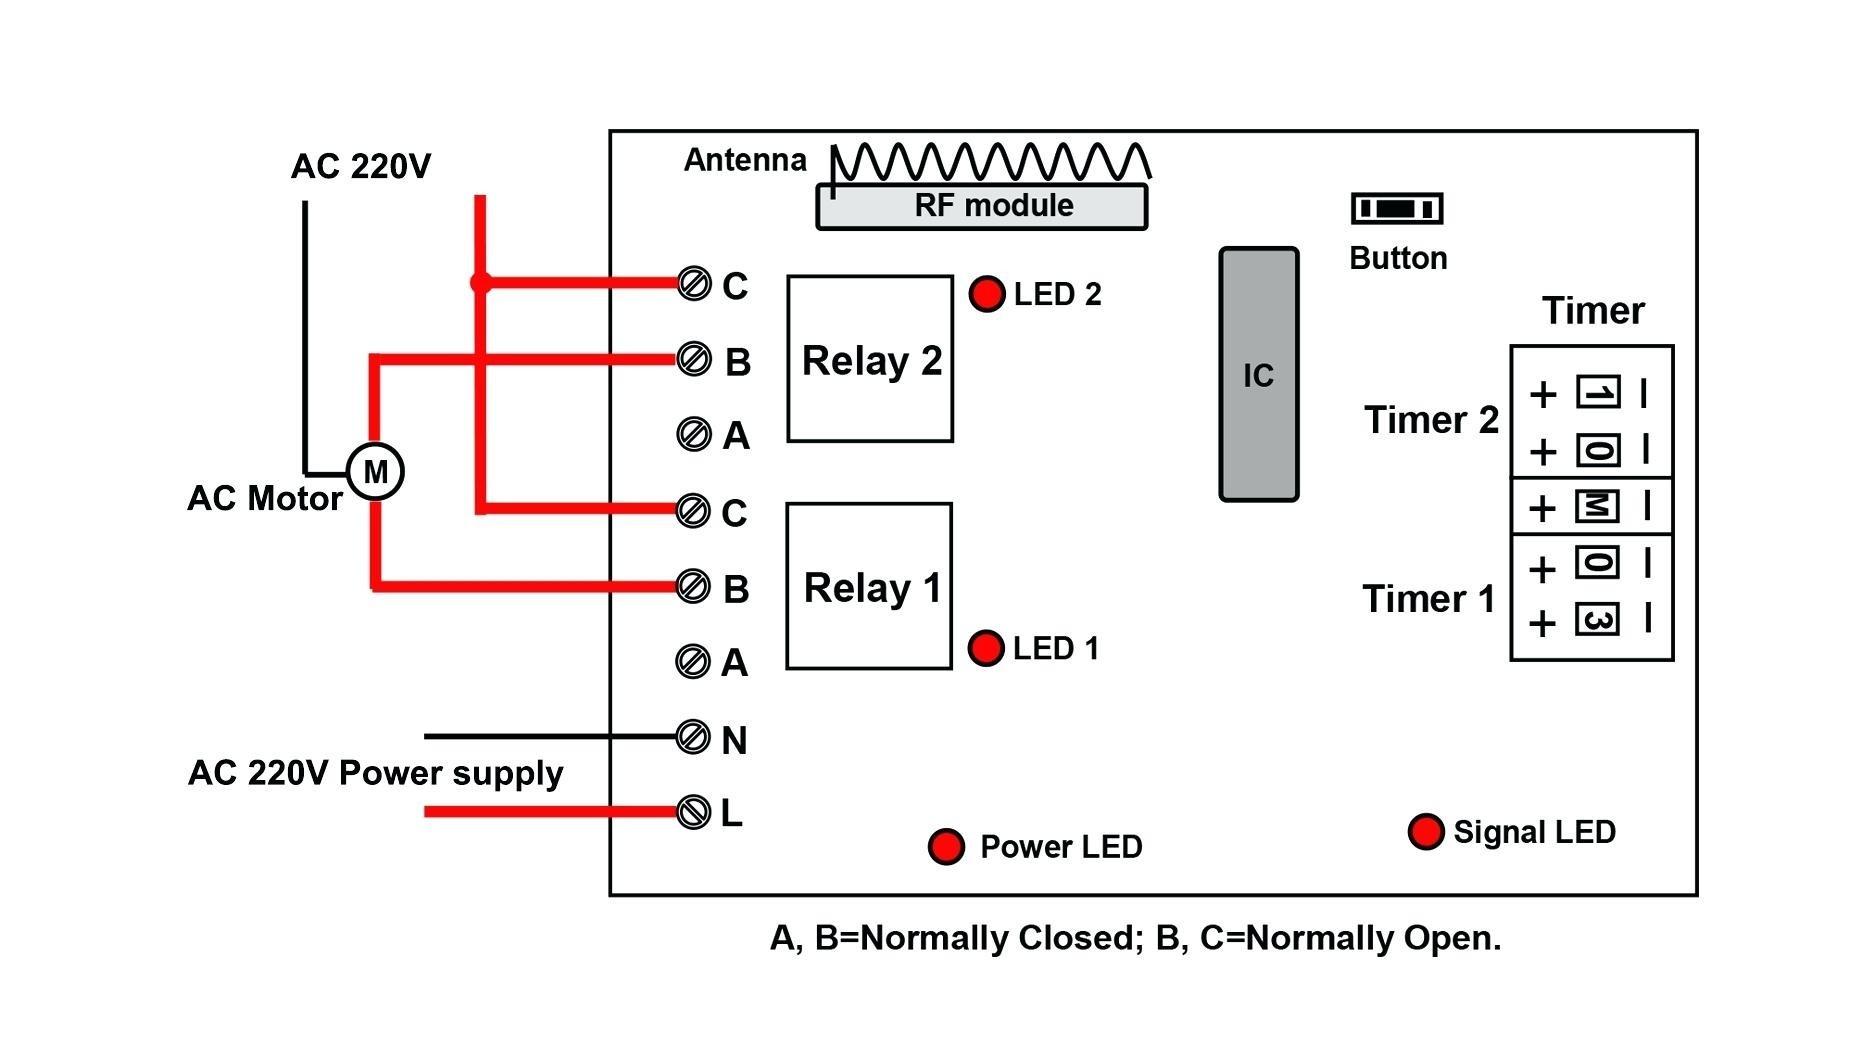 Wiring Diagram for Magnetek Motor New Grundfos Pump Wiring Diagram Elegant Dwk O 6 50 22